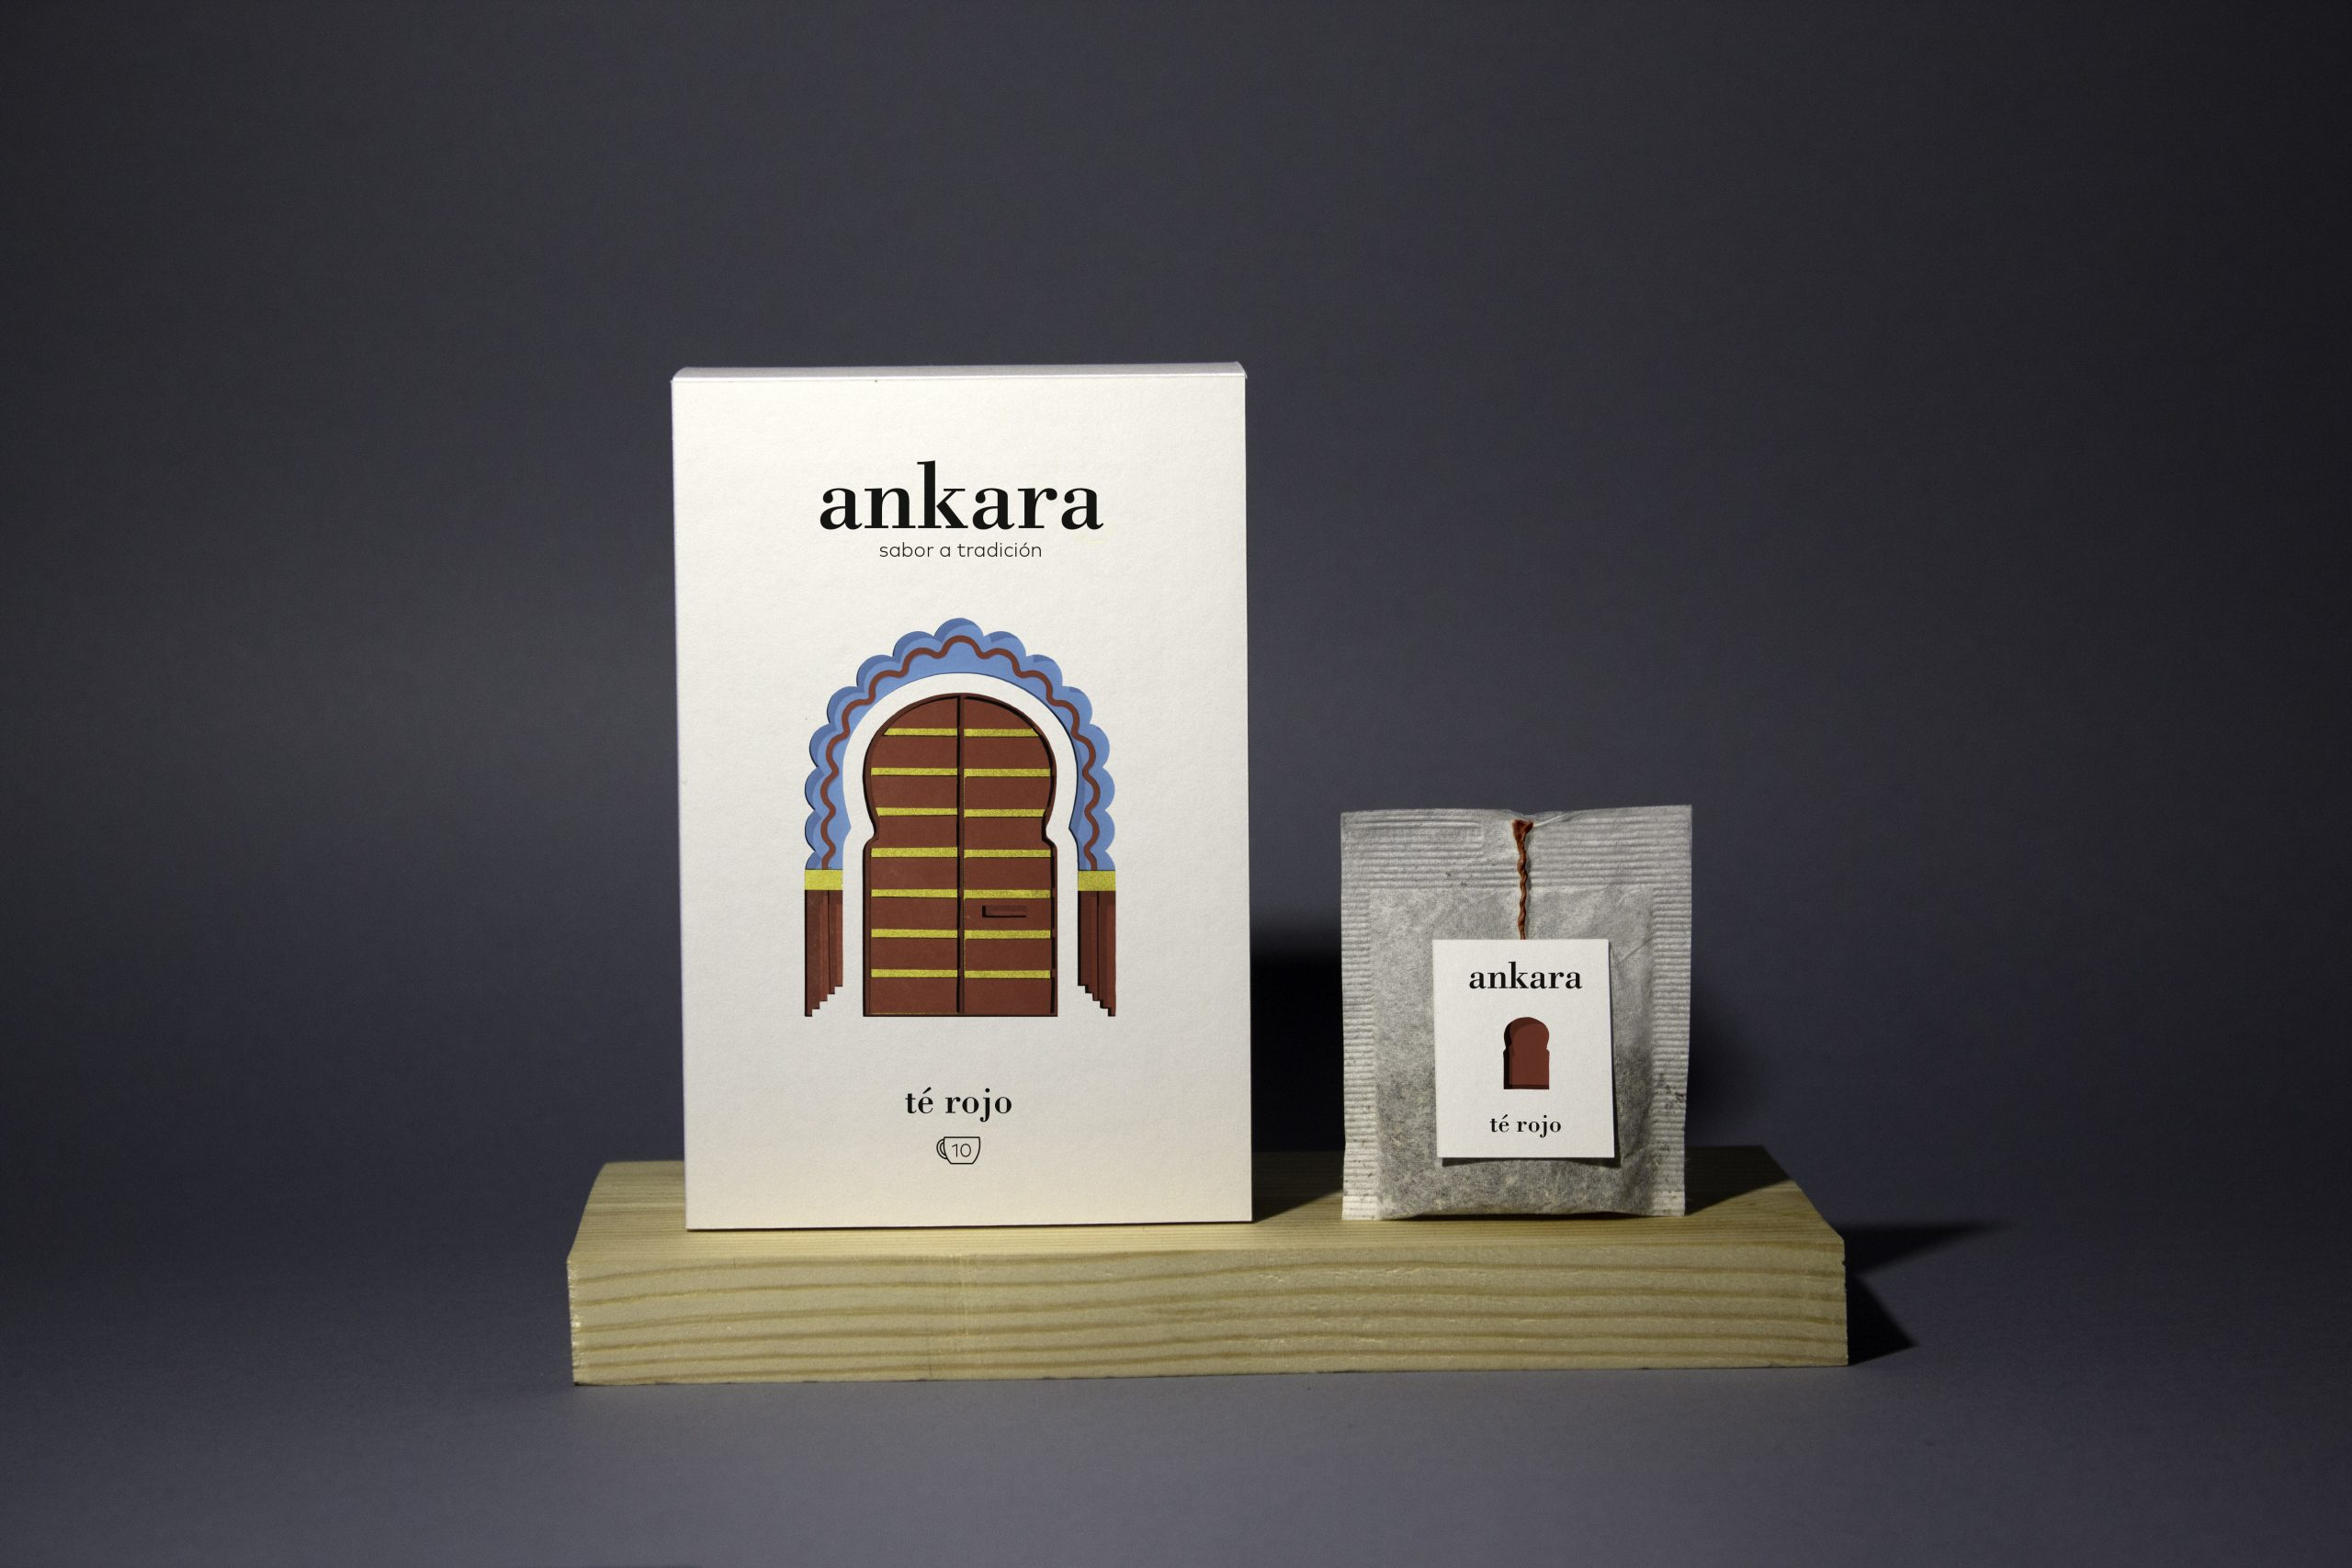 ankara-te-rojo-copia